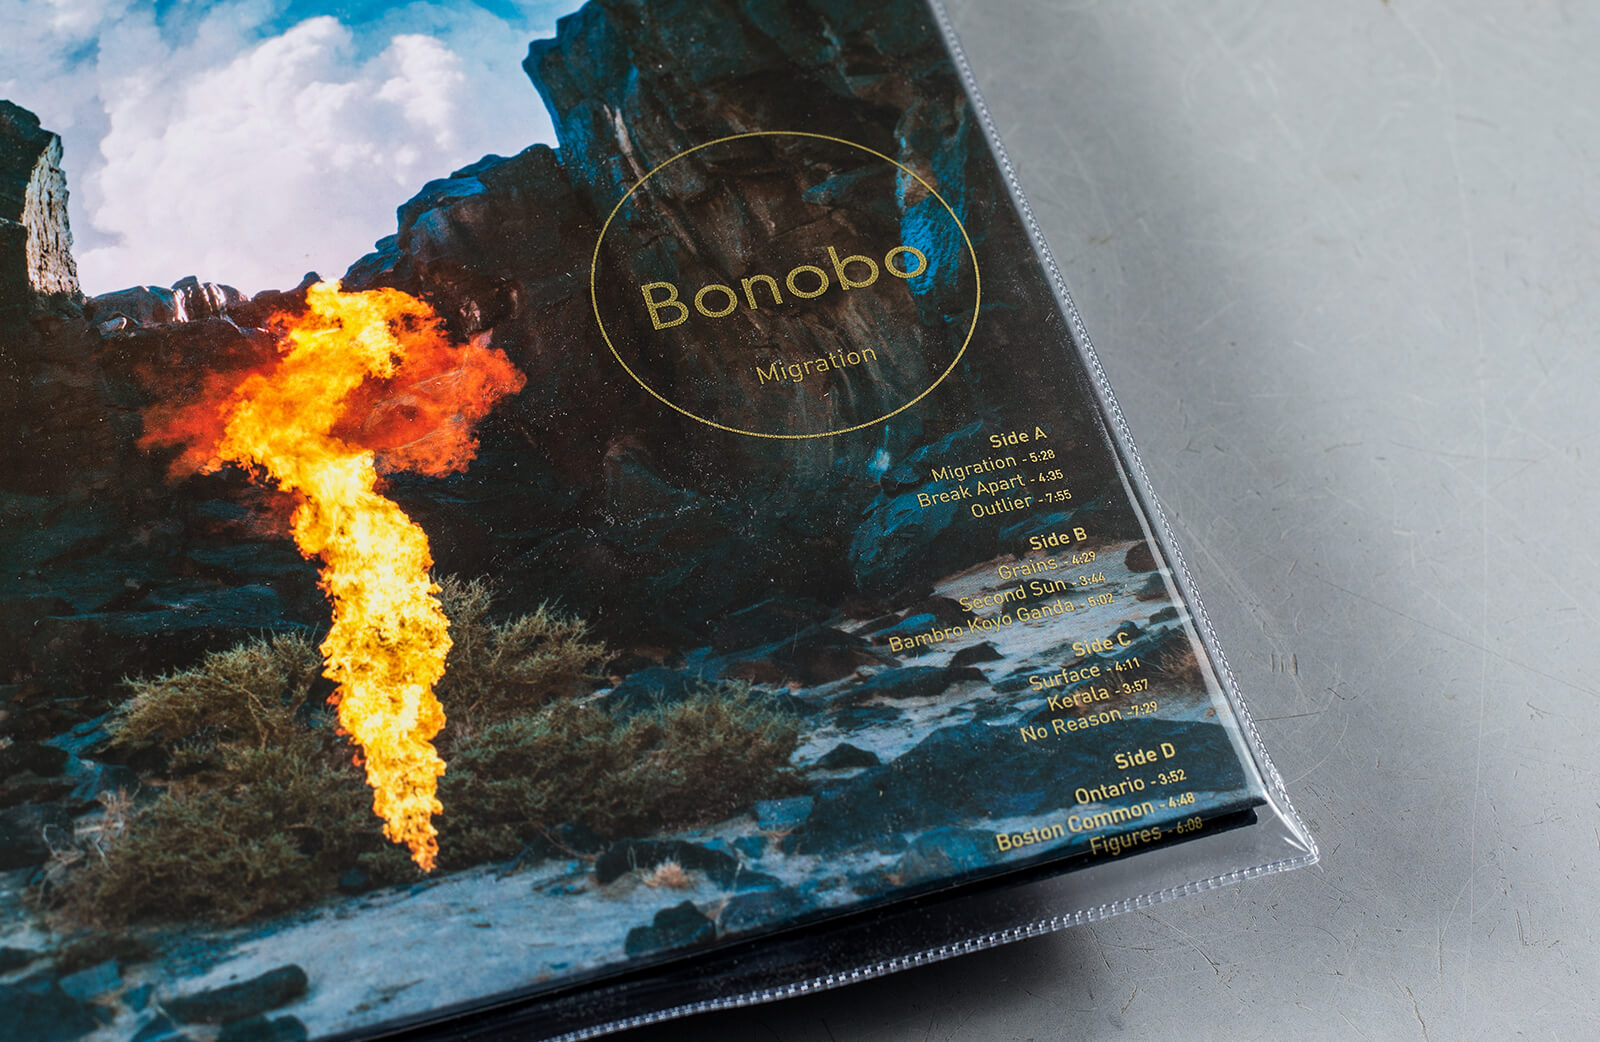 bonobo-migration-vinyl-edition_0009_at8w0031